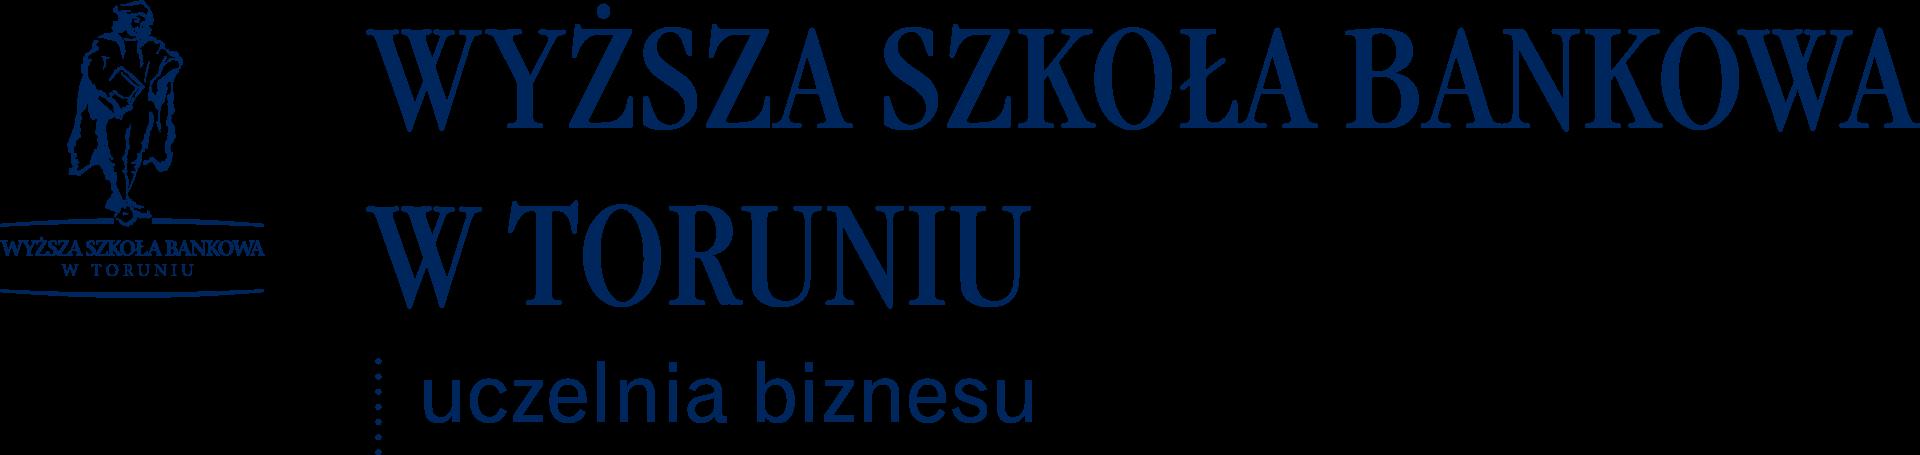 Wyzsza Szkola Bankowa w Toruniu (WSB UNIVERSITY TORUN) banner